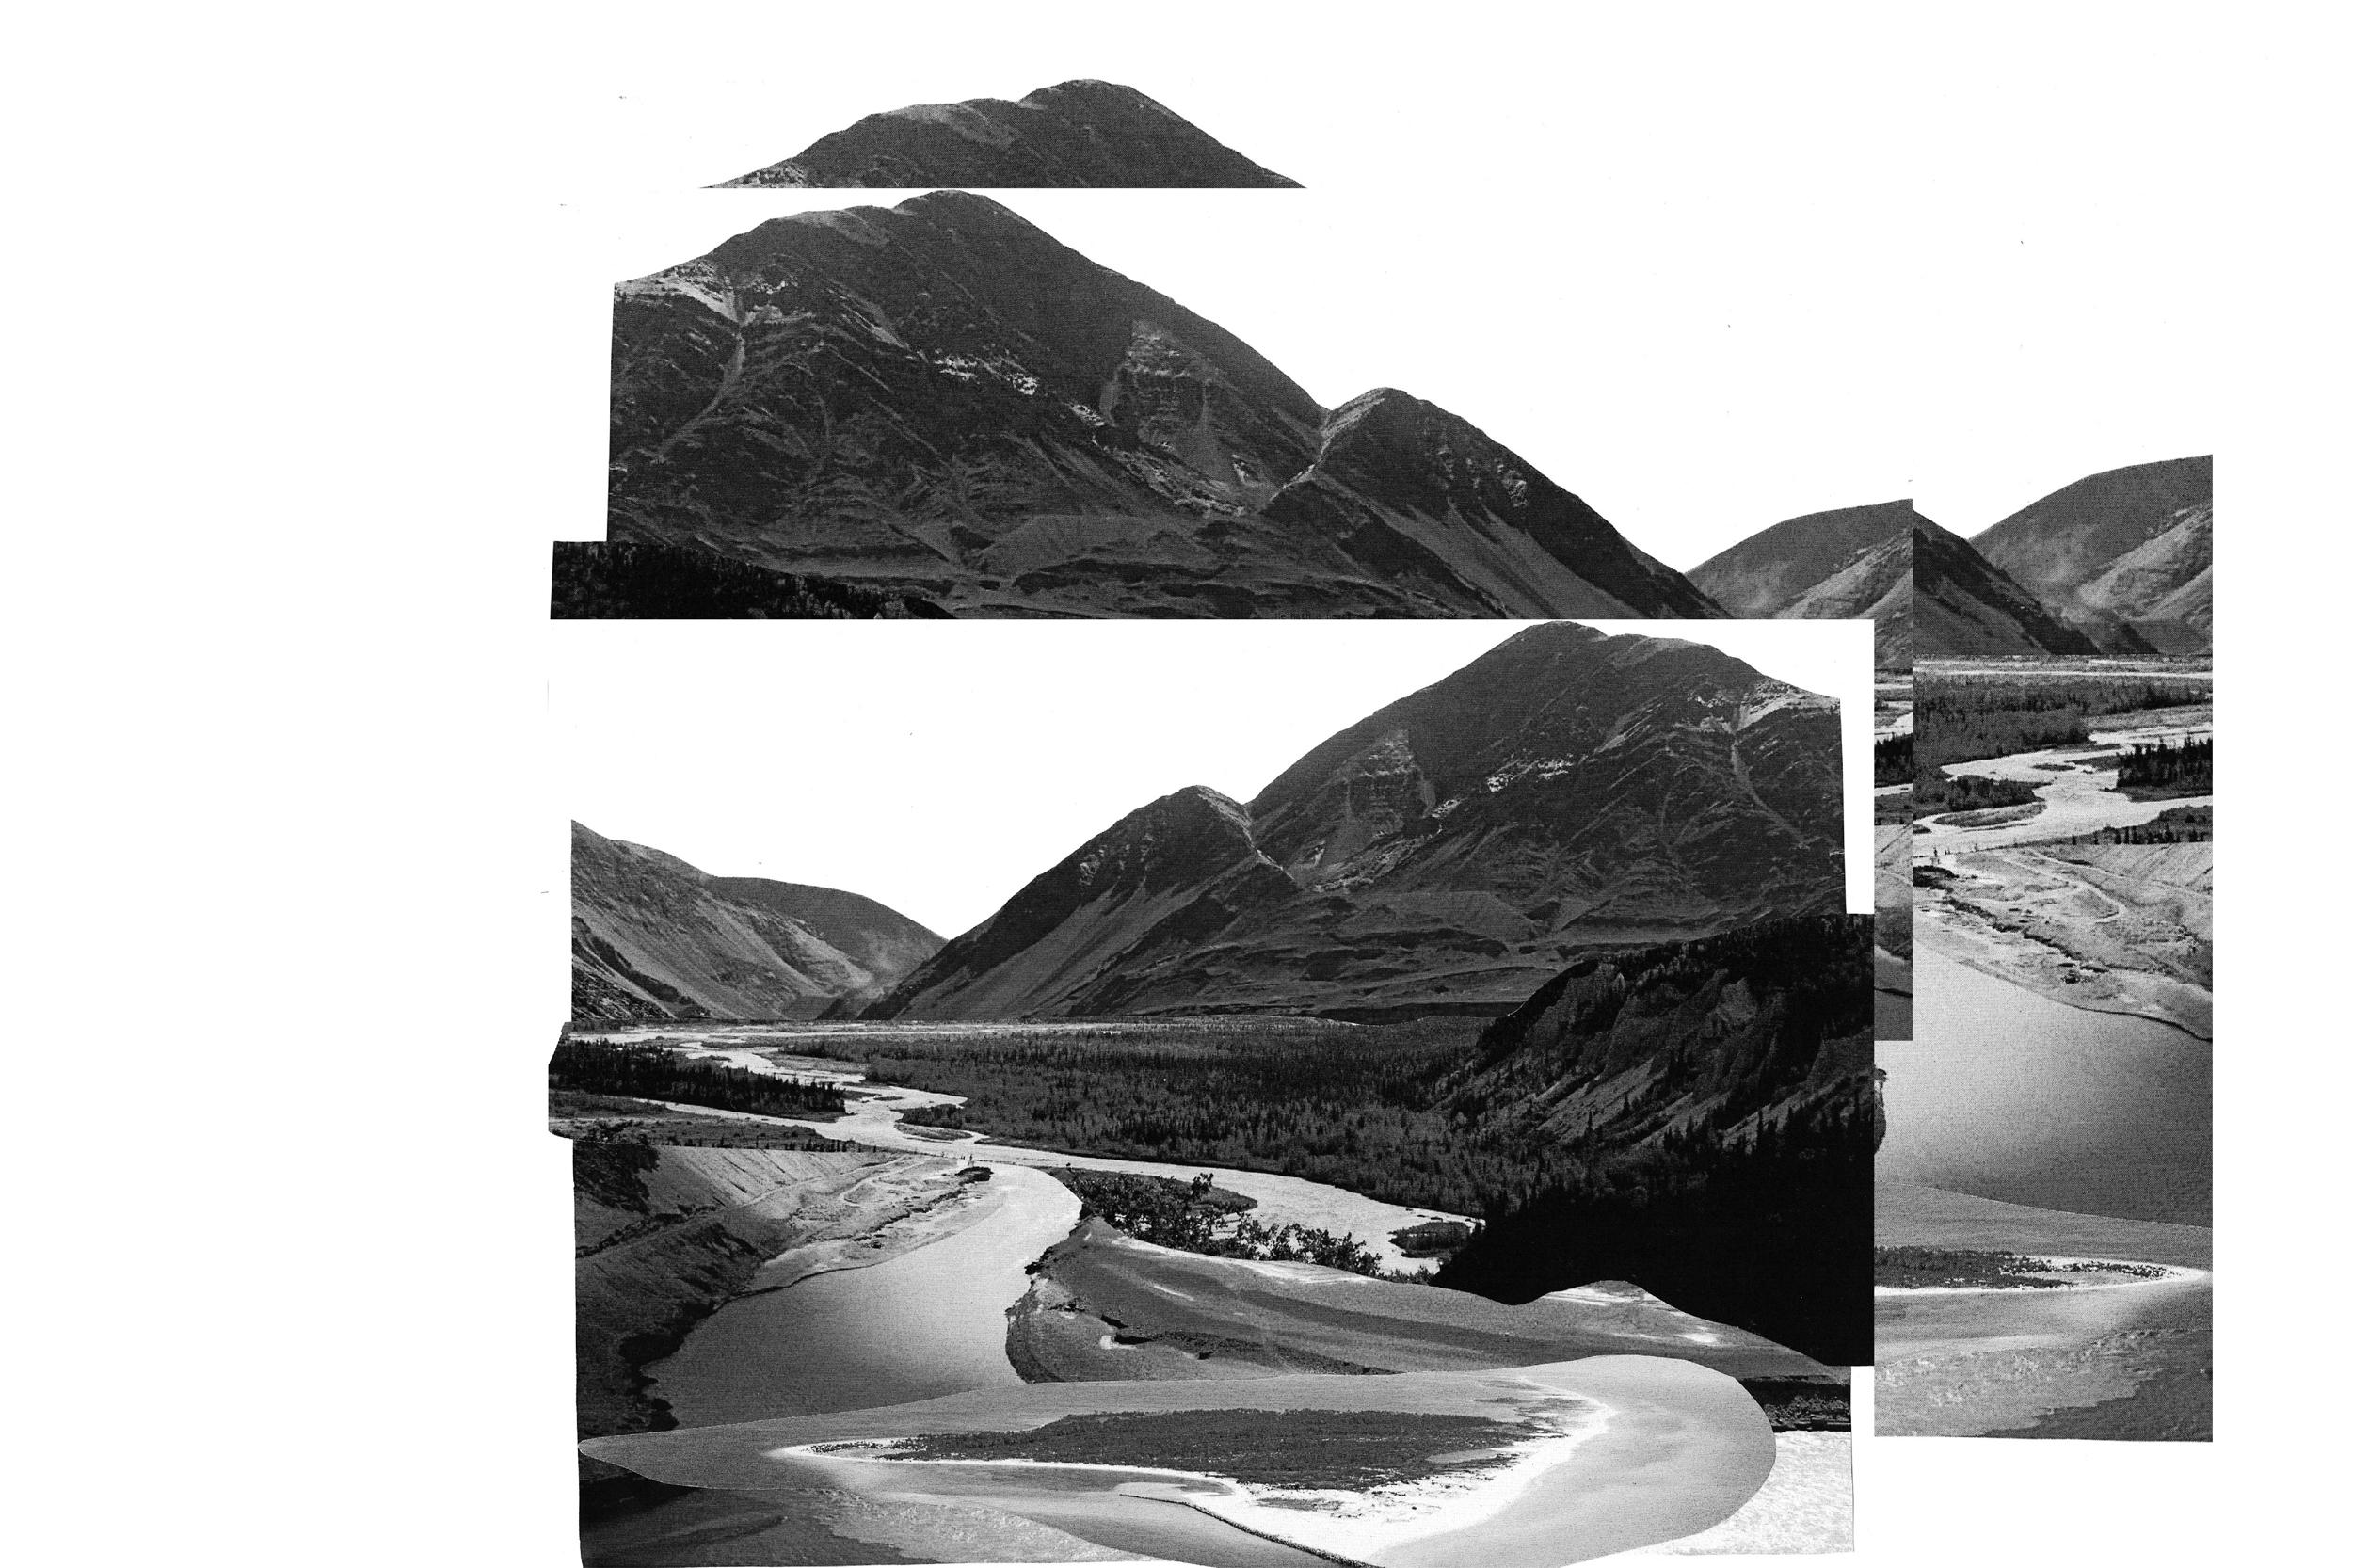 FARADAY_collage_stream.jpg